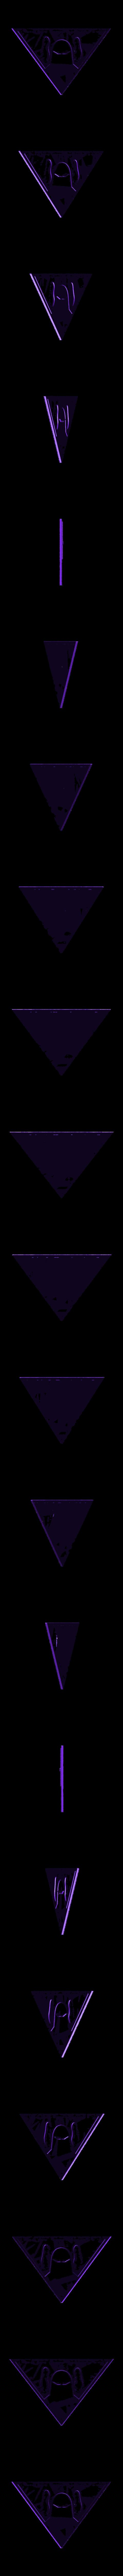 Base.stl Download free STL file Space Ghost • 3D printer model, mag-net